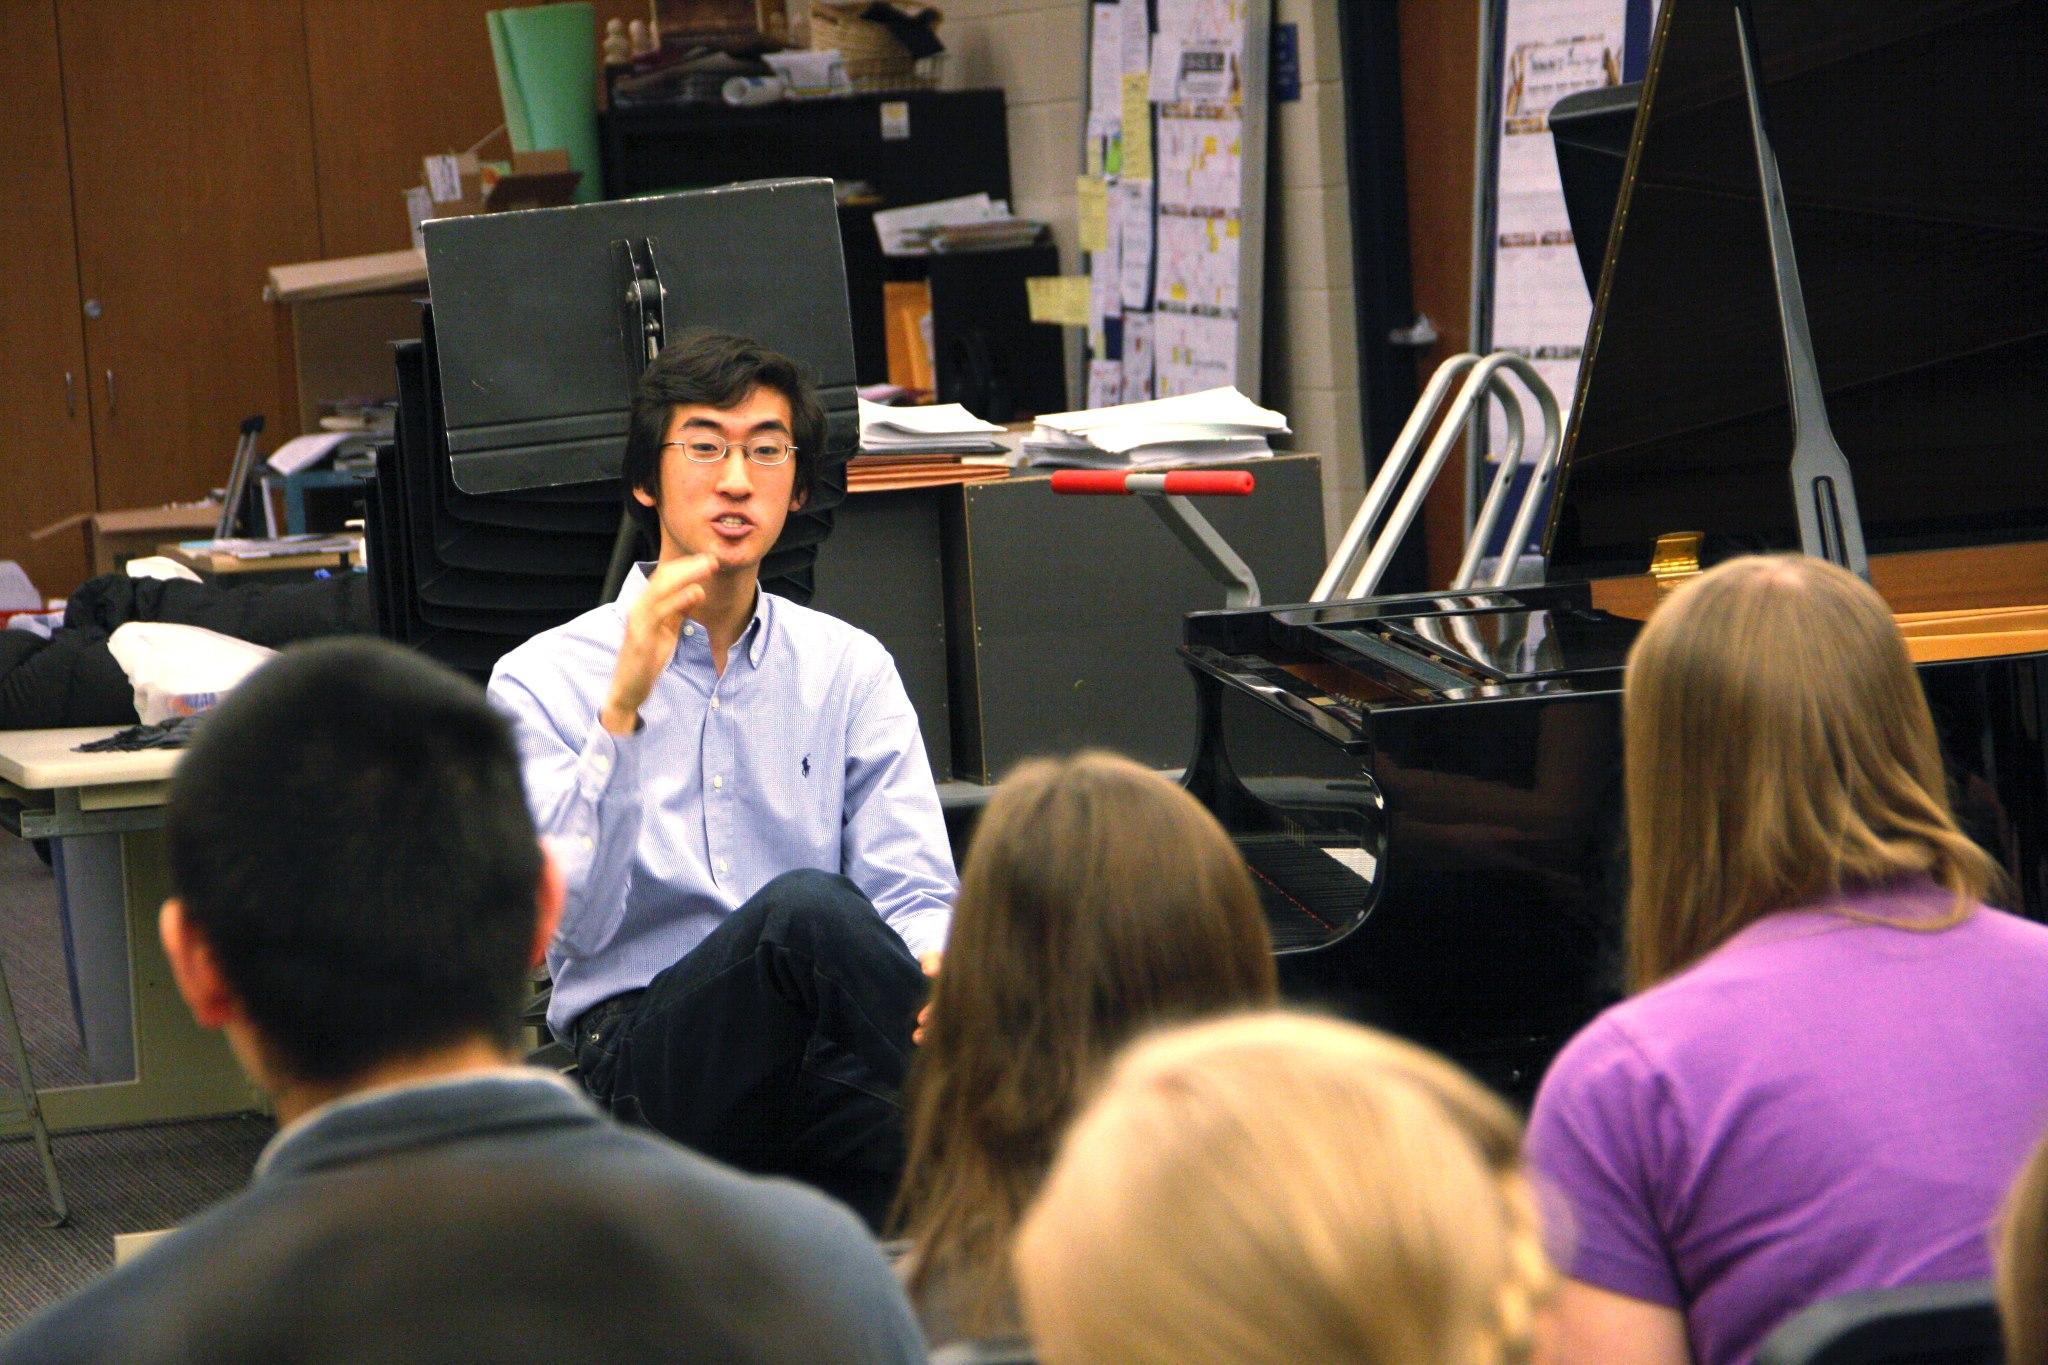 Speaking to students in Brookfield High School, Brookfield, WI